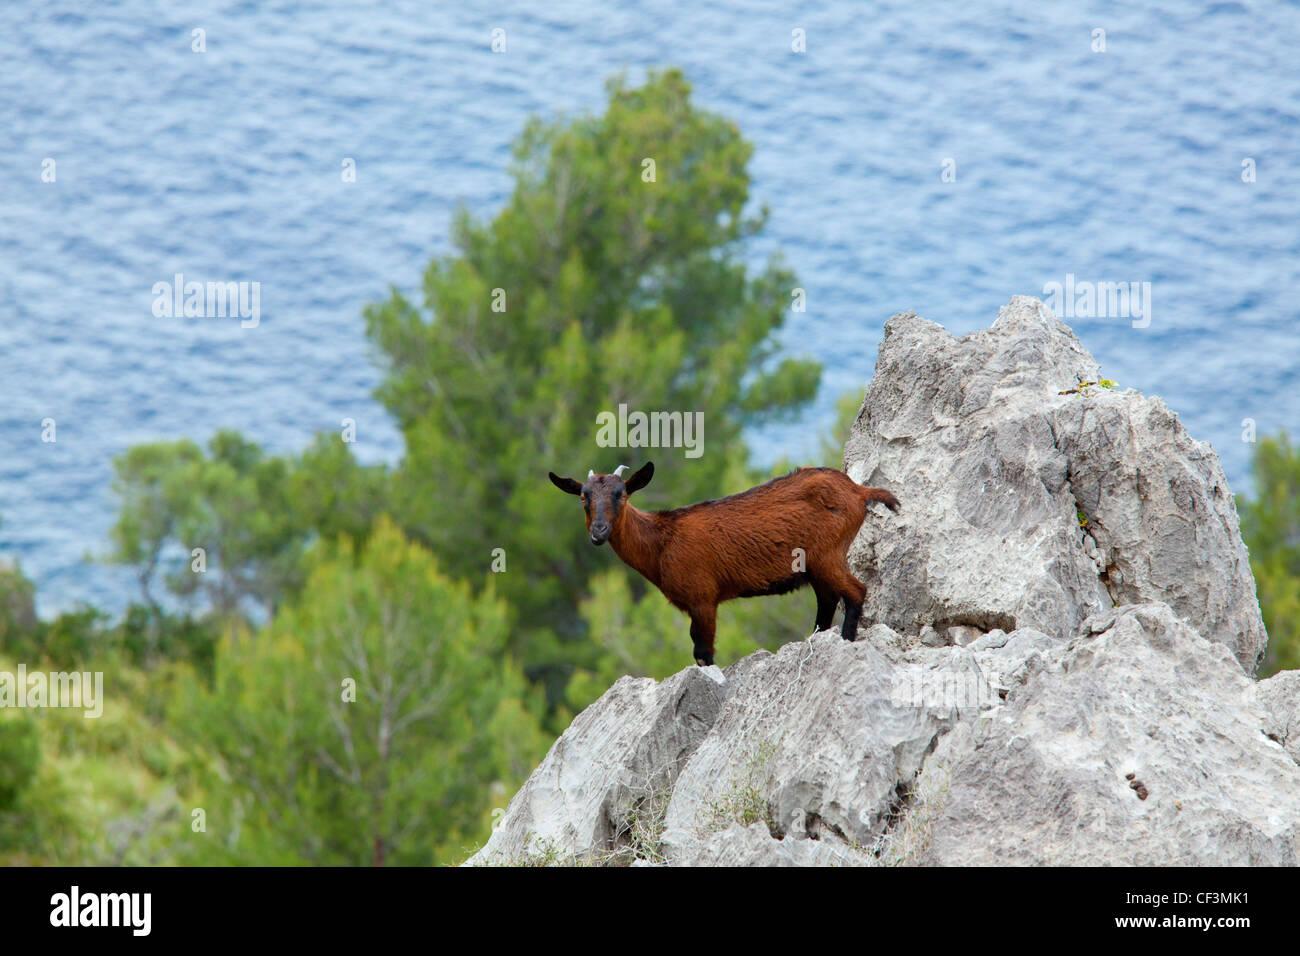 Feral domestic goat on a rock near Sa Calobra, Majorca, Spain - Stock Image